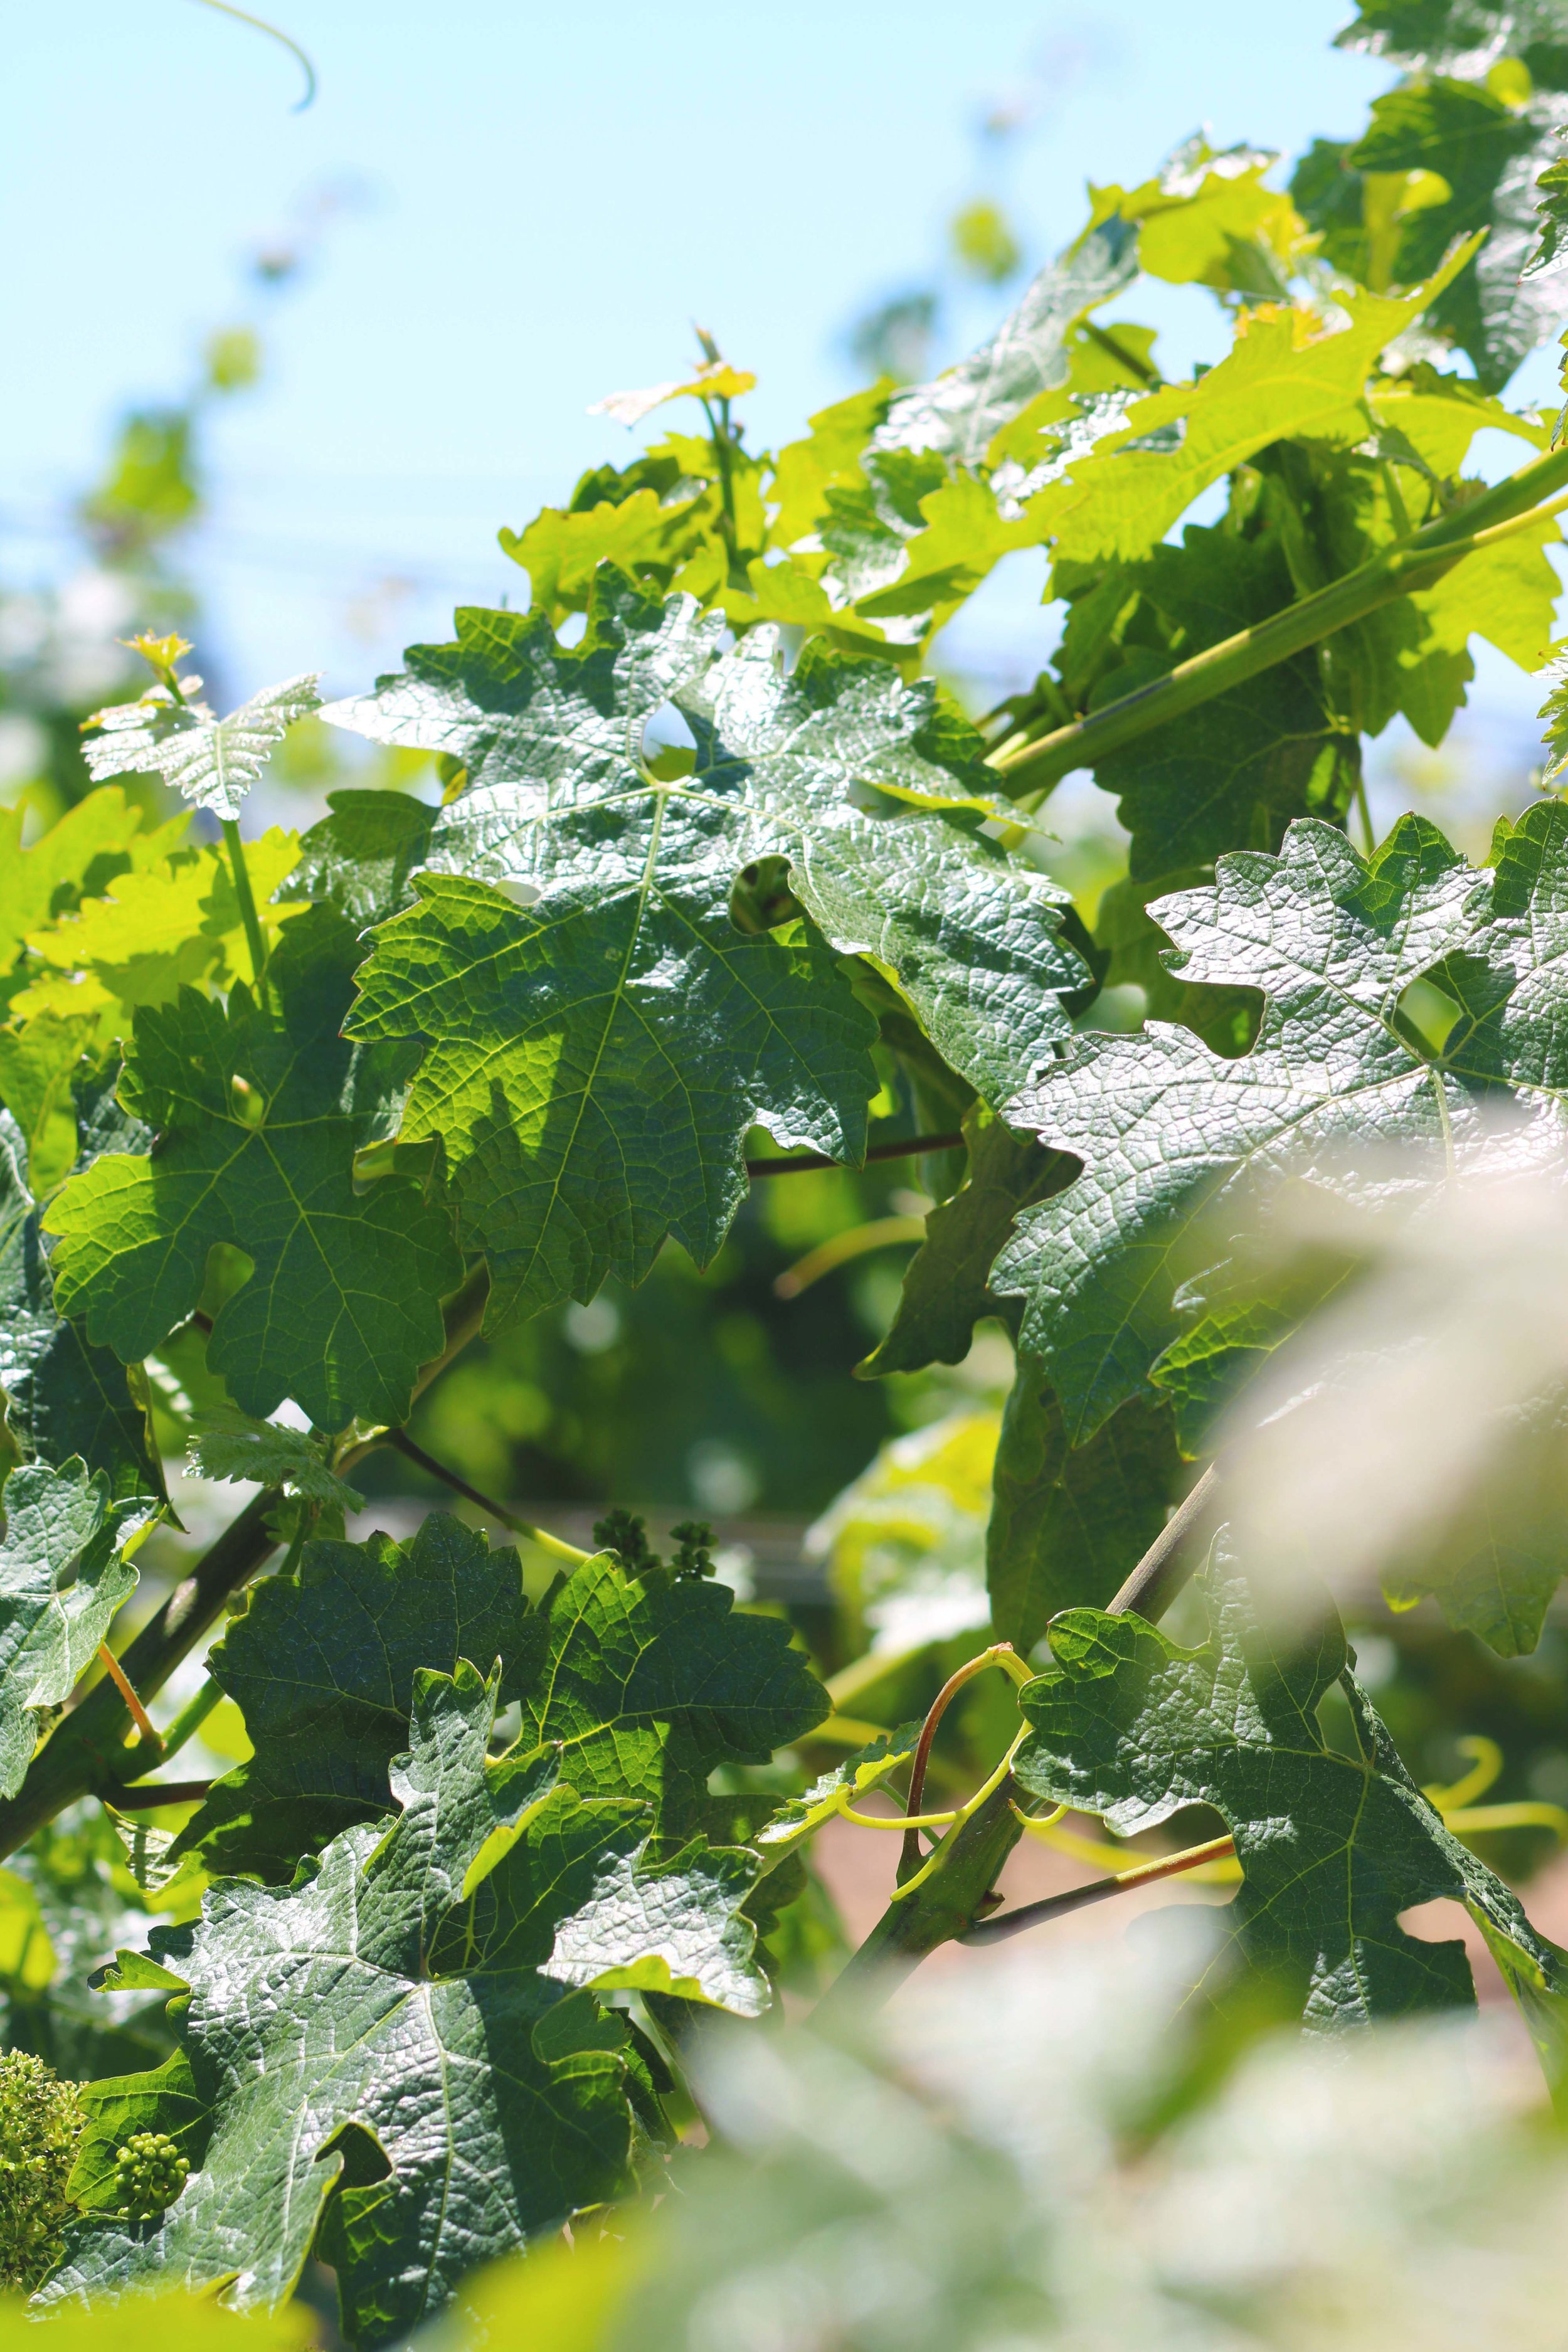 napa valley grape leaves andretti winery